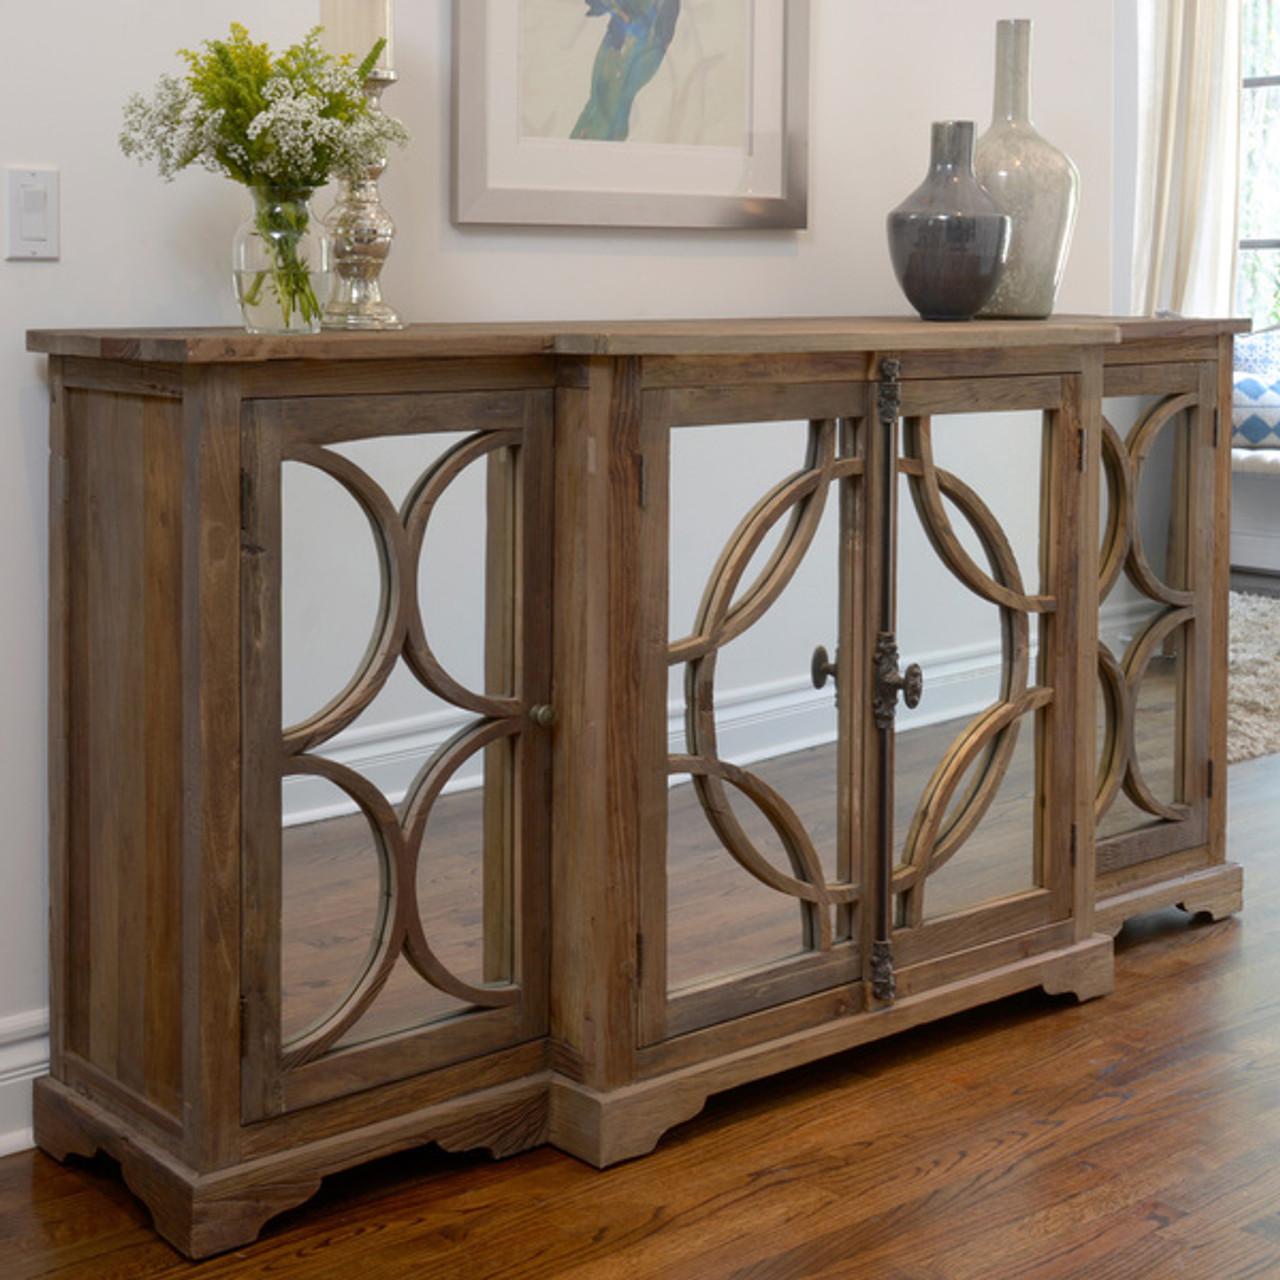 Wells Reclaimed Elm Wood Mirrored Sideboard Buffet Zin Home